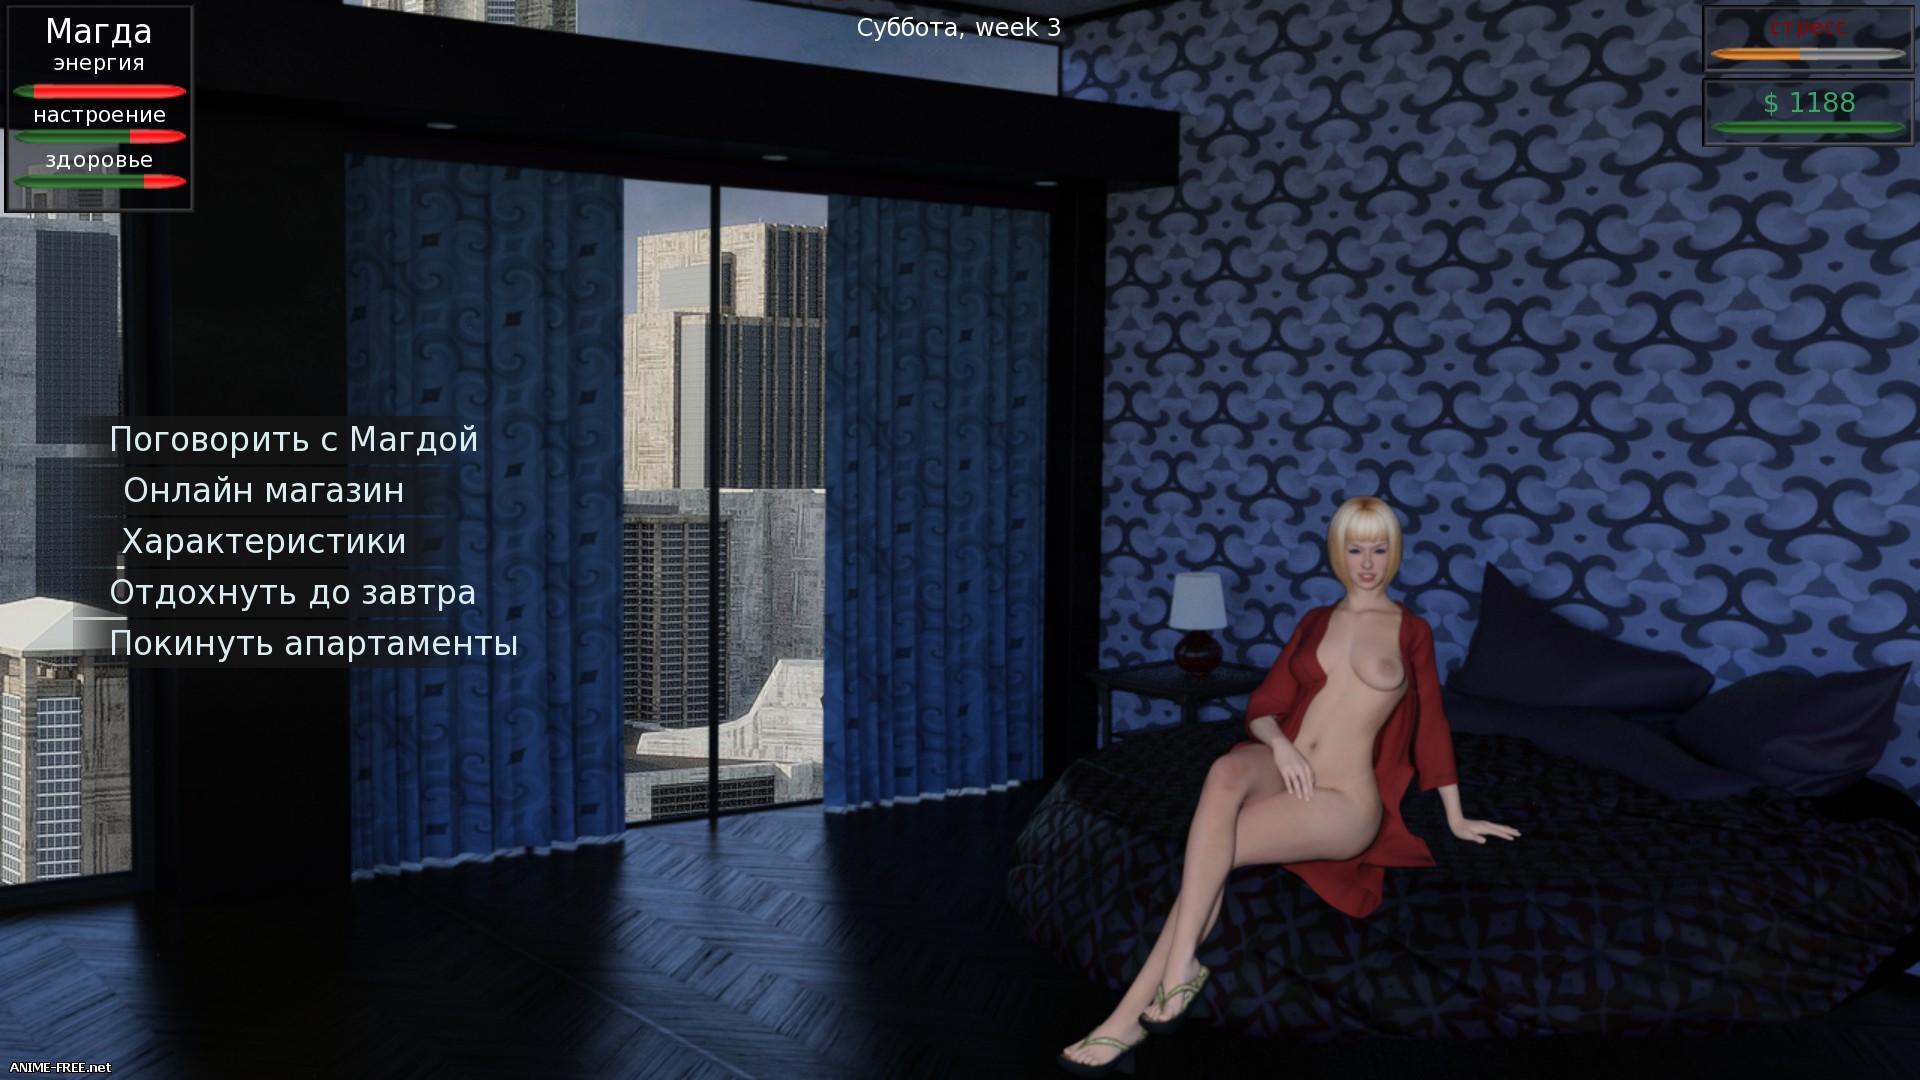 Rise Of The Pornstar [2017] [Uncen] [ADV, SLG, 3DCG] [RUS] H-Game